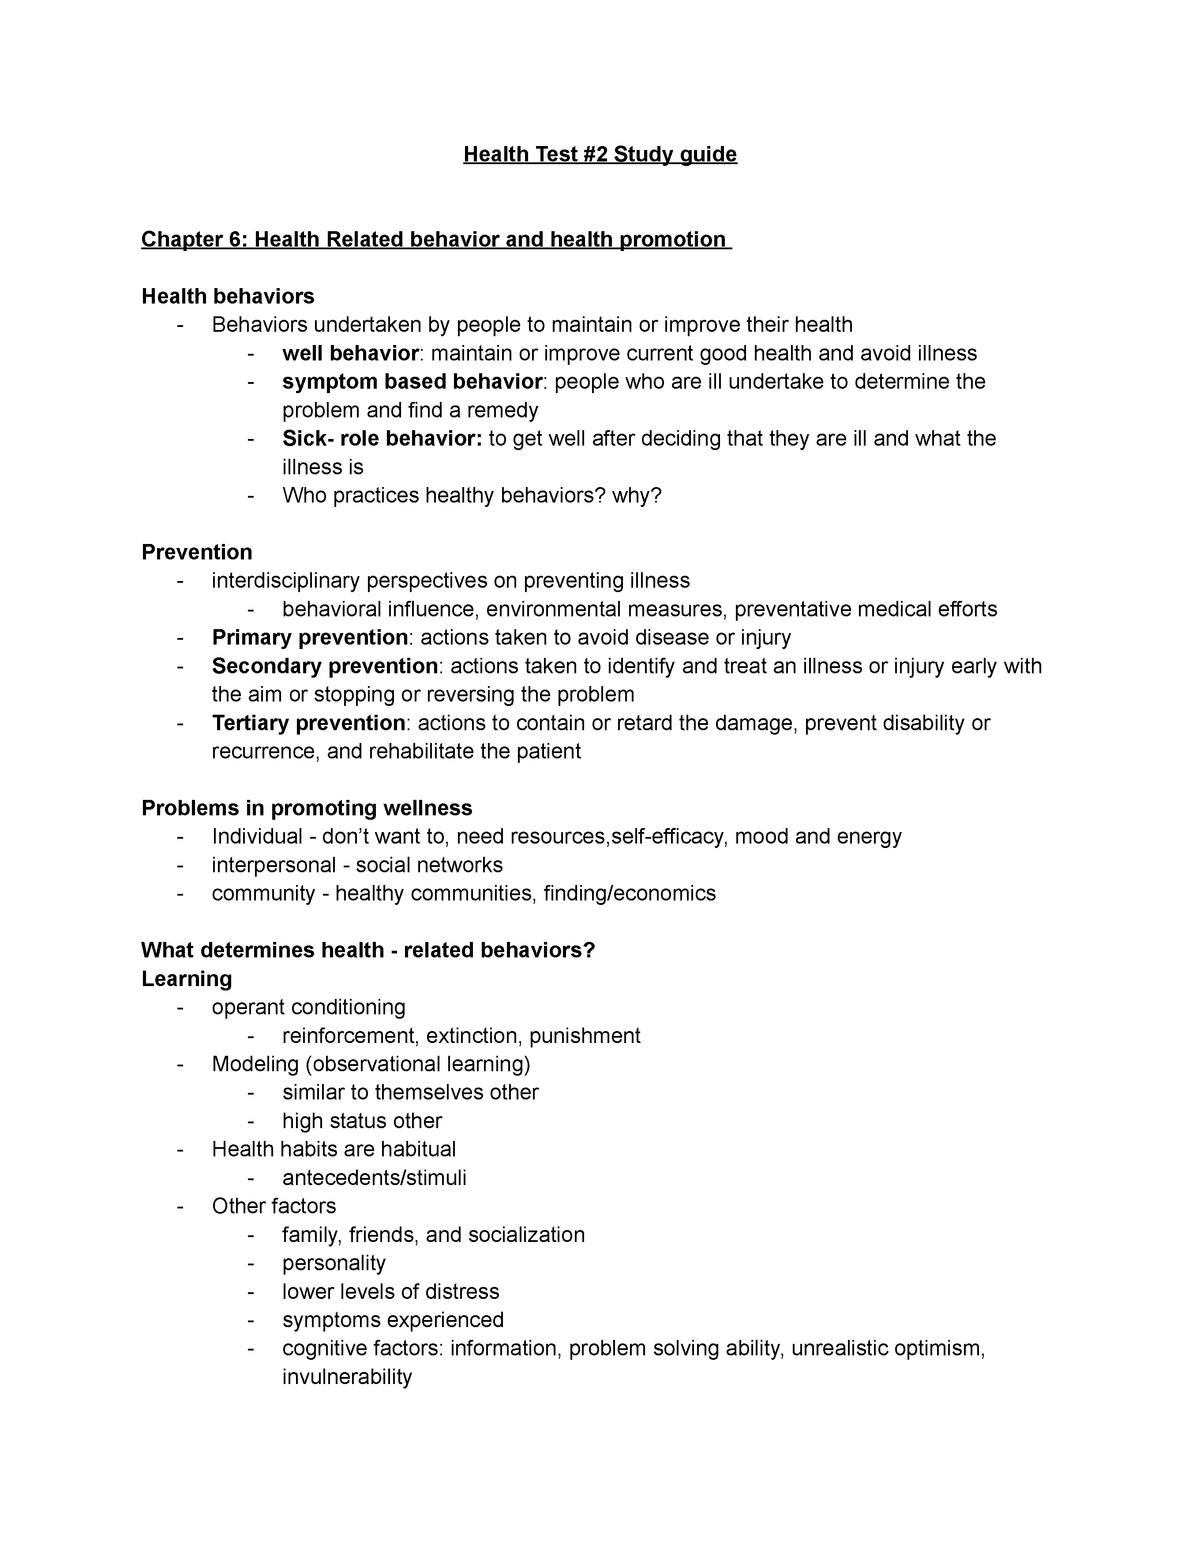 Health Test #2 - Test 2 review - PSY 407 - SDSU - StuDocu